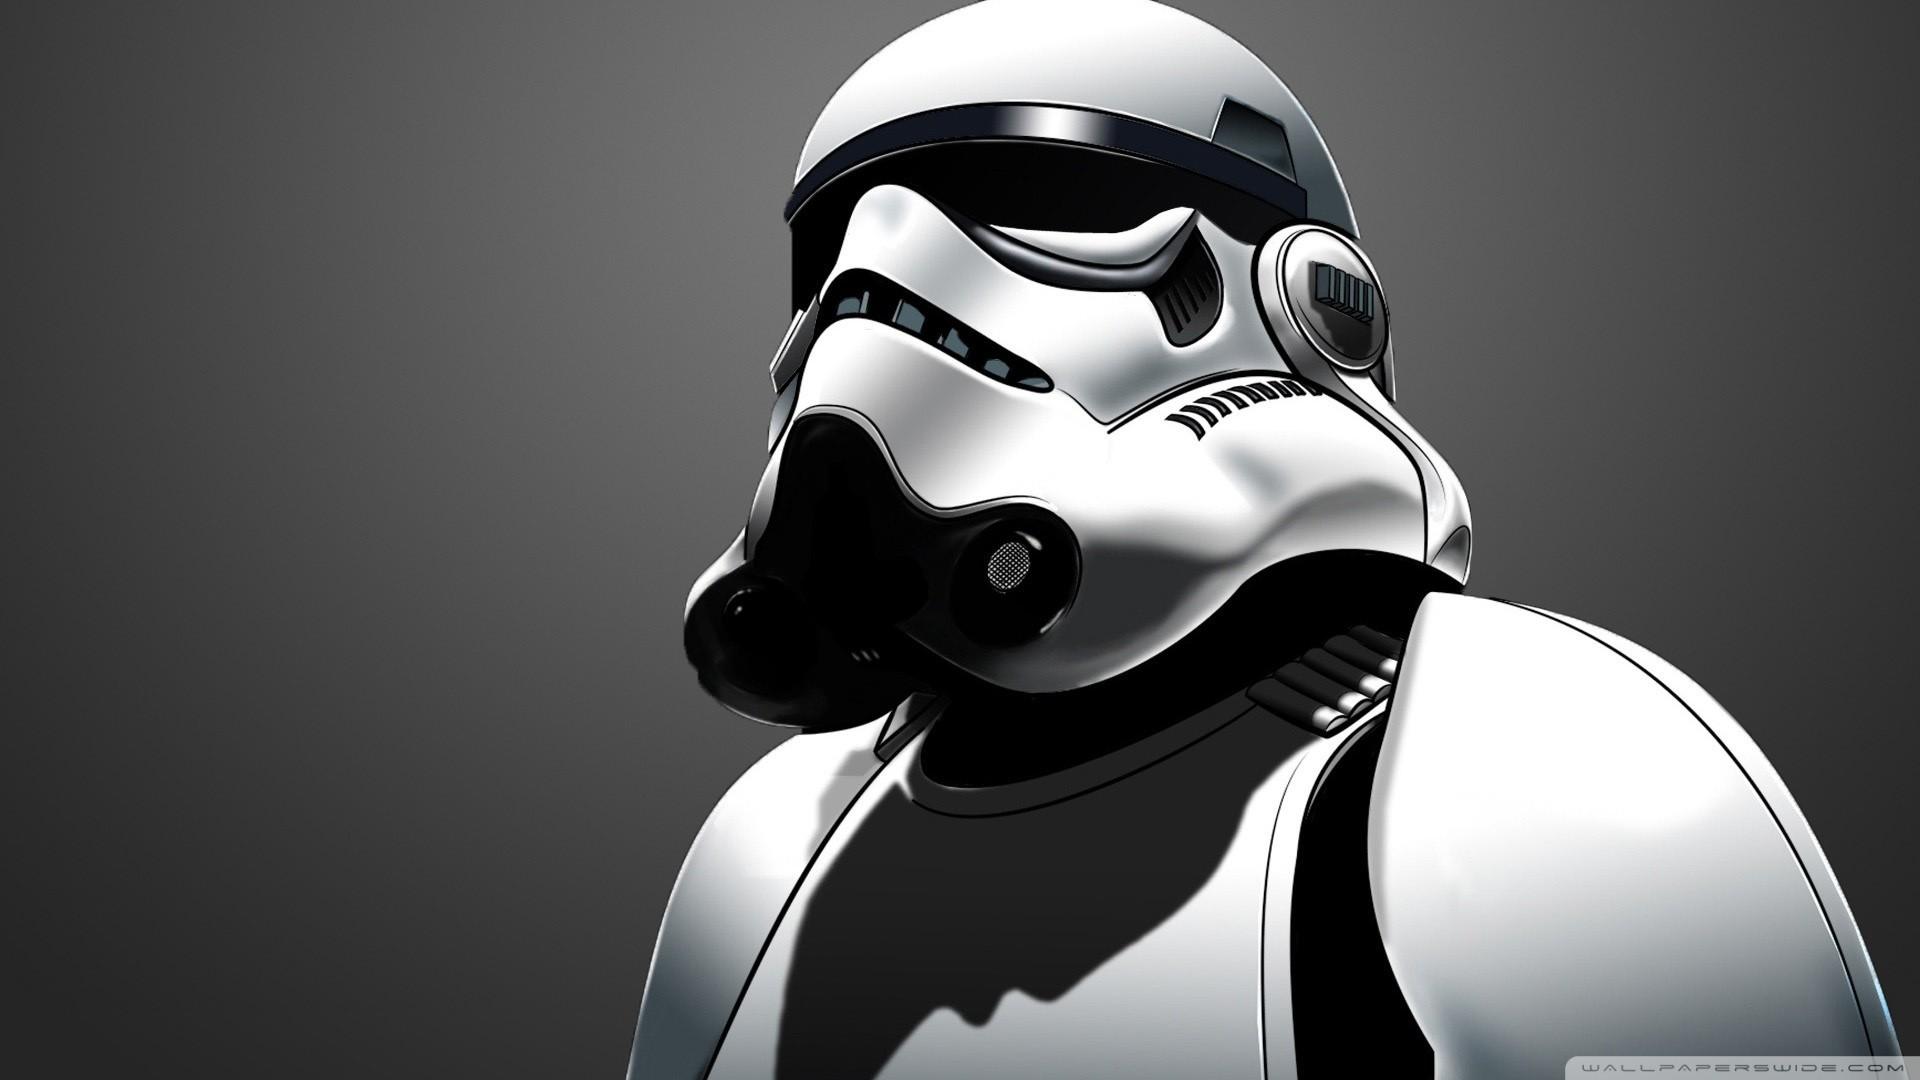 … star wars storm trooper hd desktop wallpaper widescreen high …